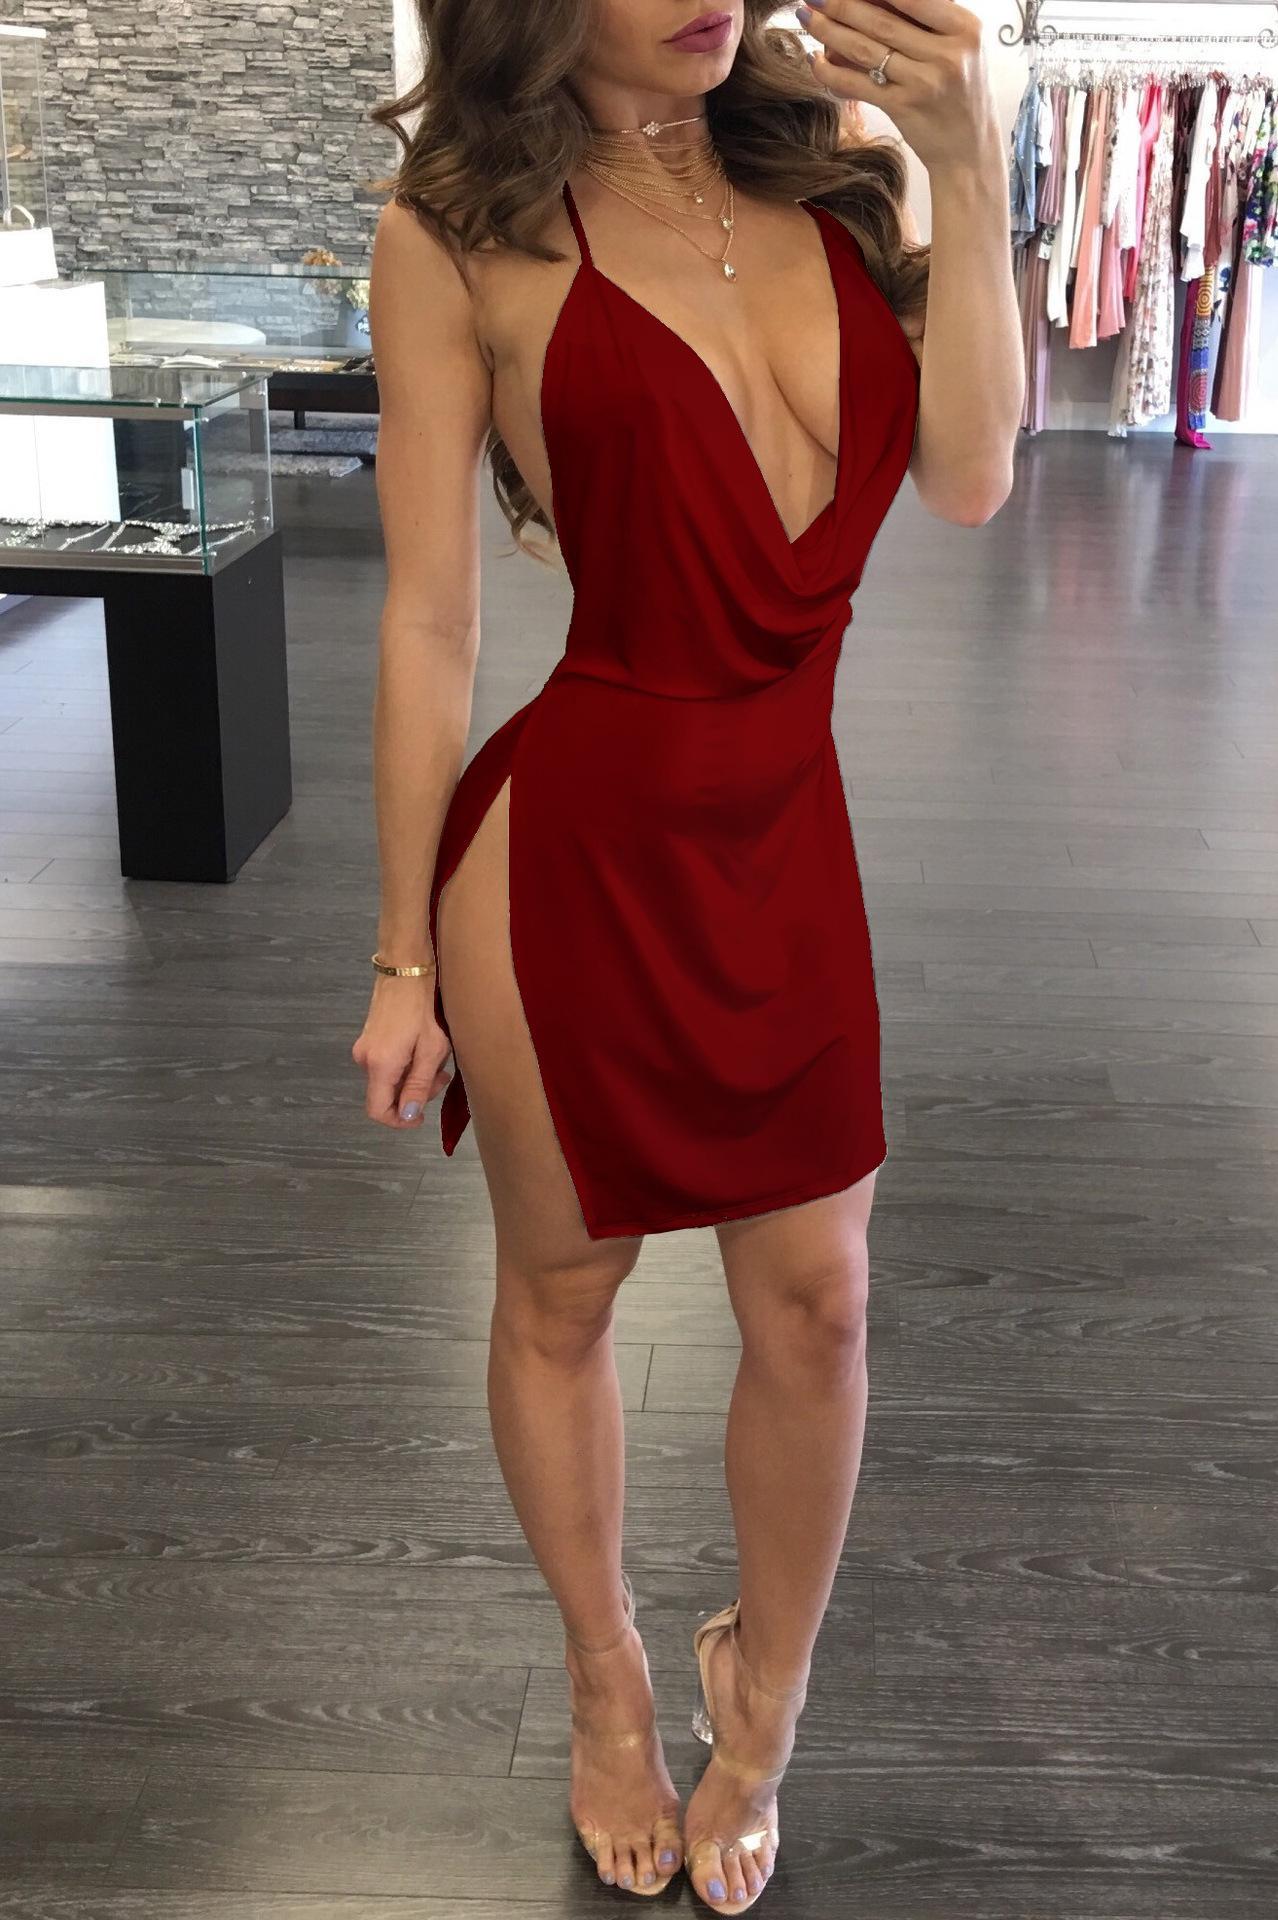 cae26c93e72 Summer Women Lace Dress Sexy Backless V Neck Beach Dresses 2018 Fashion  Sleeveless Spaghetti Strap White Casual Mini Sundress W6 Cocktail Wear For  Women ...